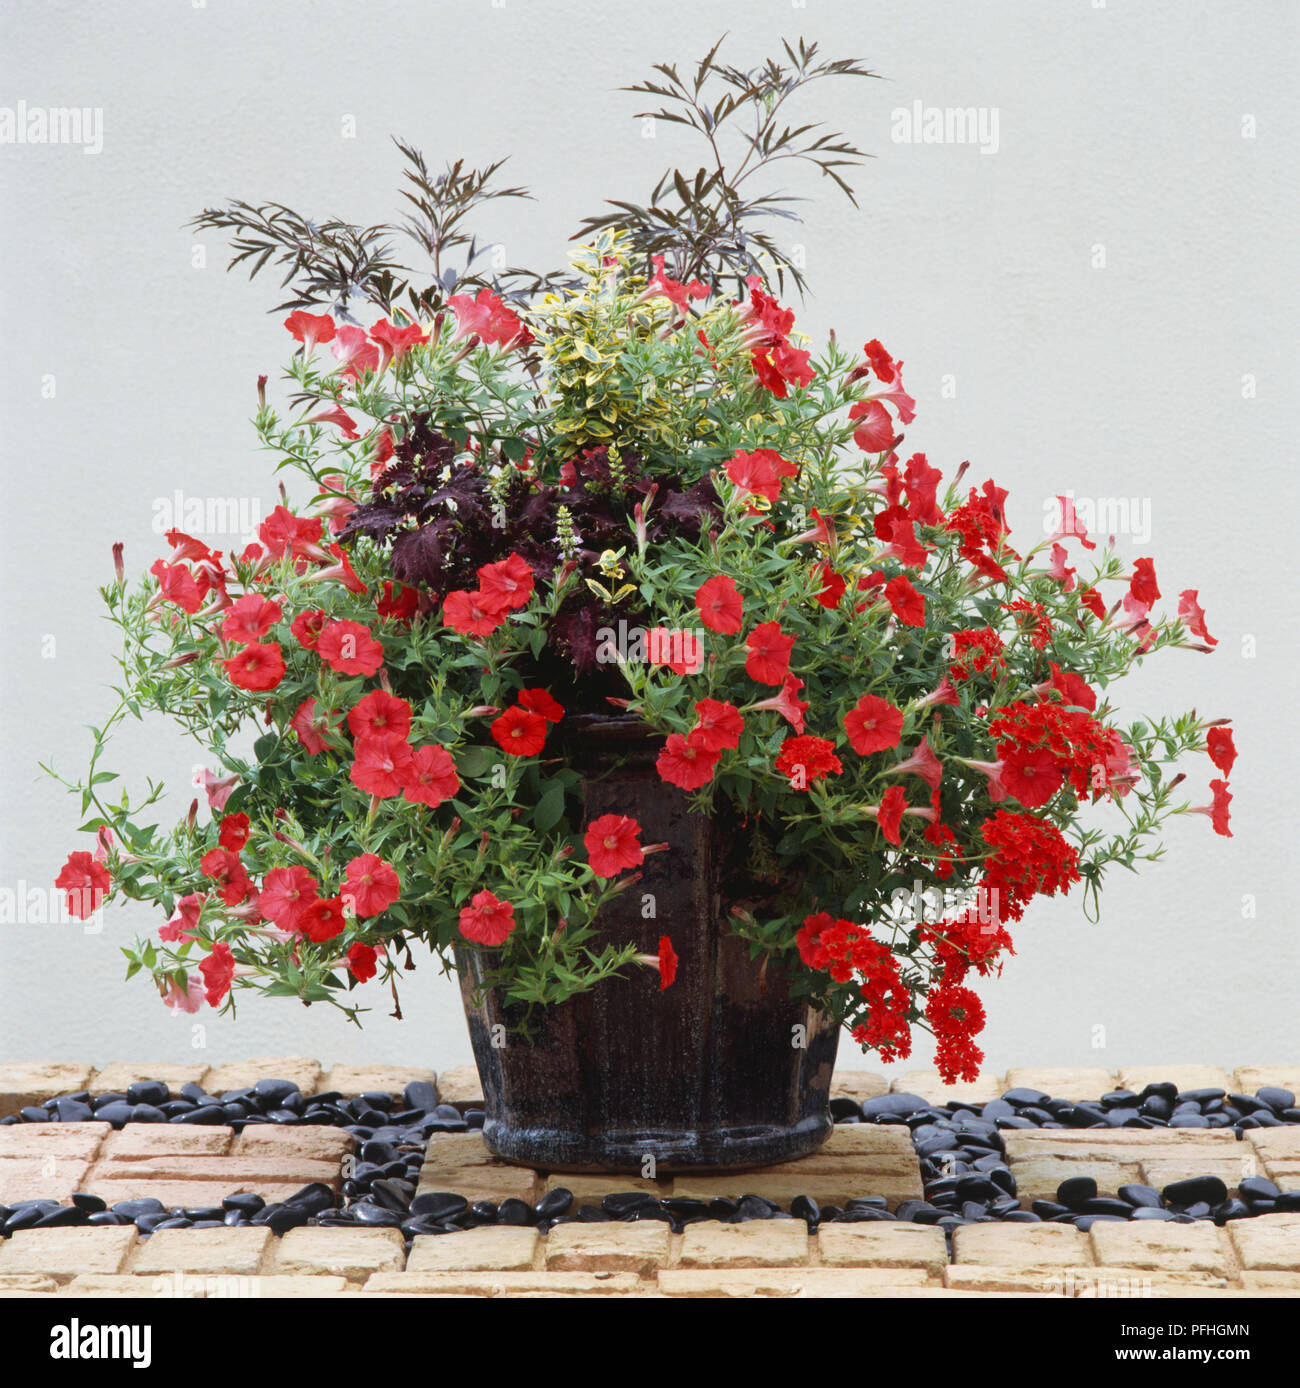 Euonymus fortunei 'Emerald 'n' Gold', Petunia 'Trailing Red', Sambucus nigra 'Black Lace', Solenostemon 'Midnight', planted in dark glazed pot - Stock Image